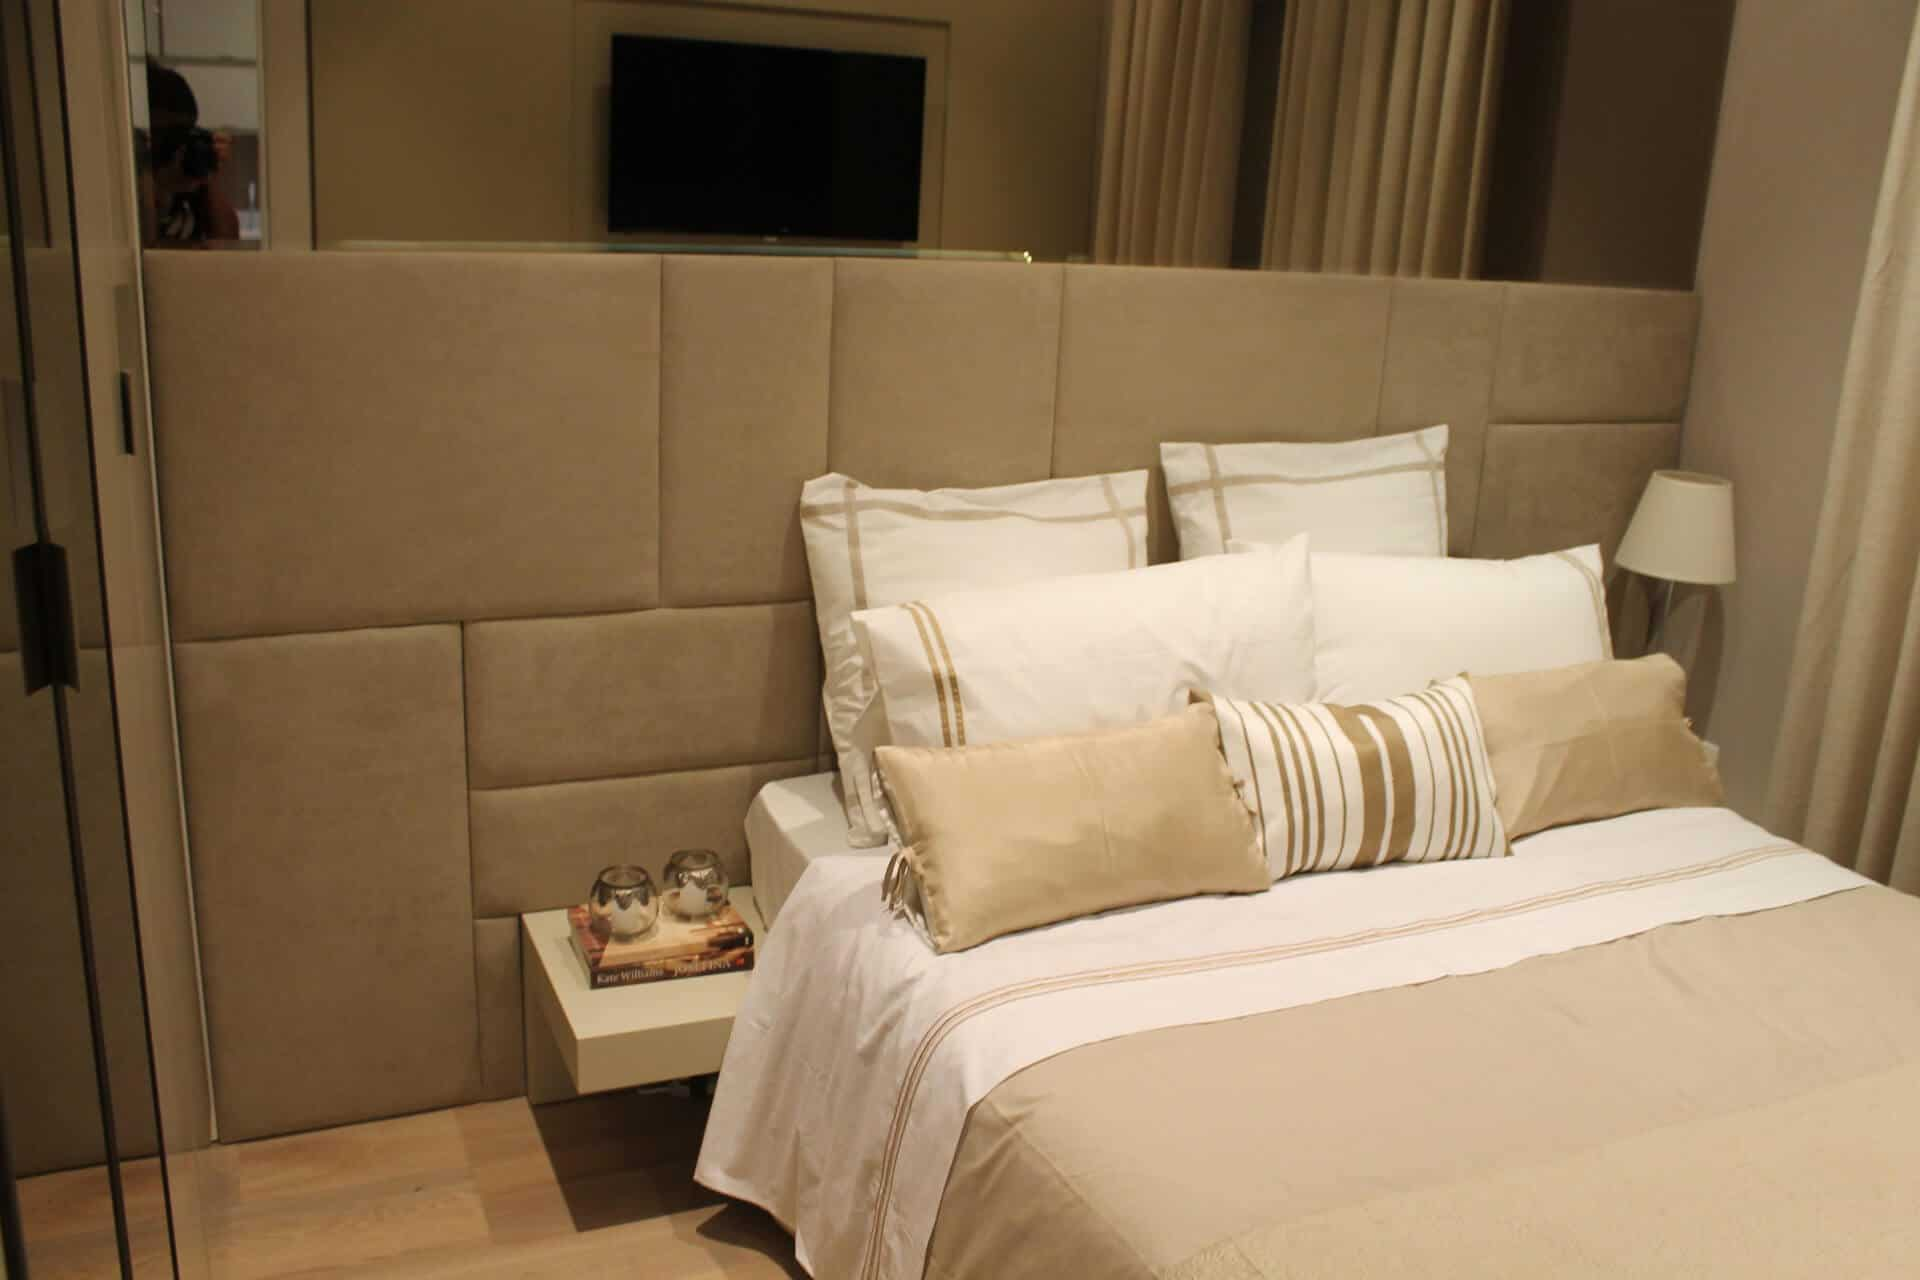 dormitorio-planejado_moveis-sob-medida-galeria-42